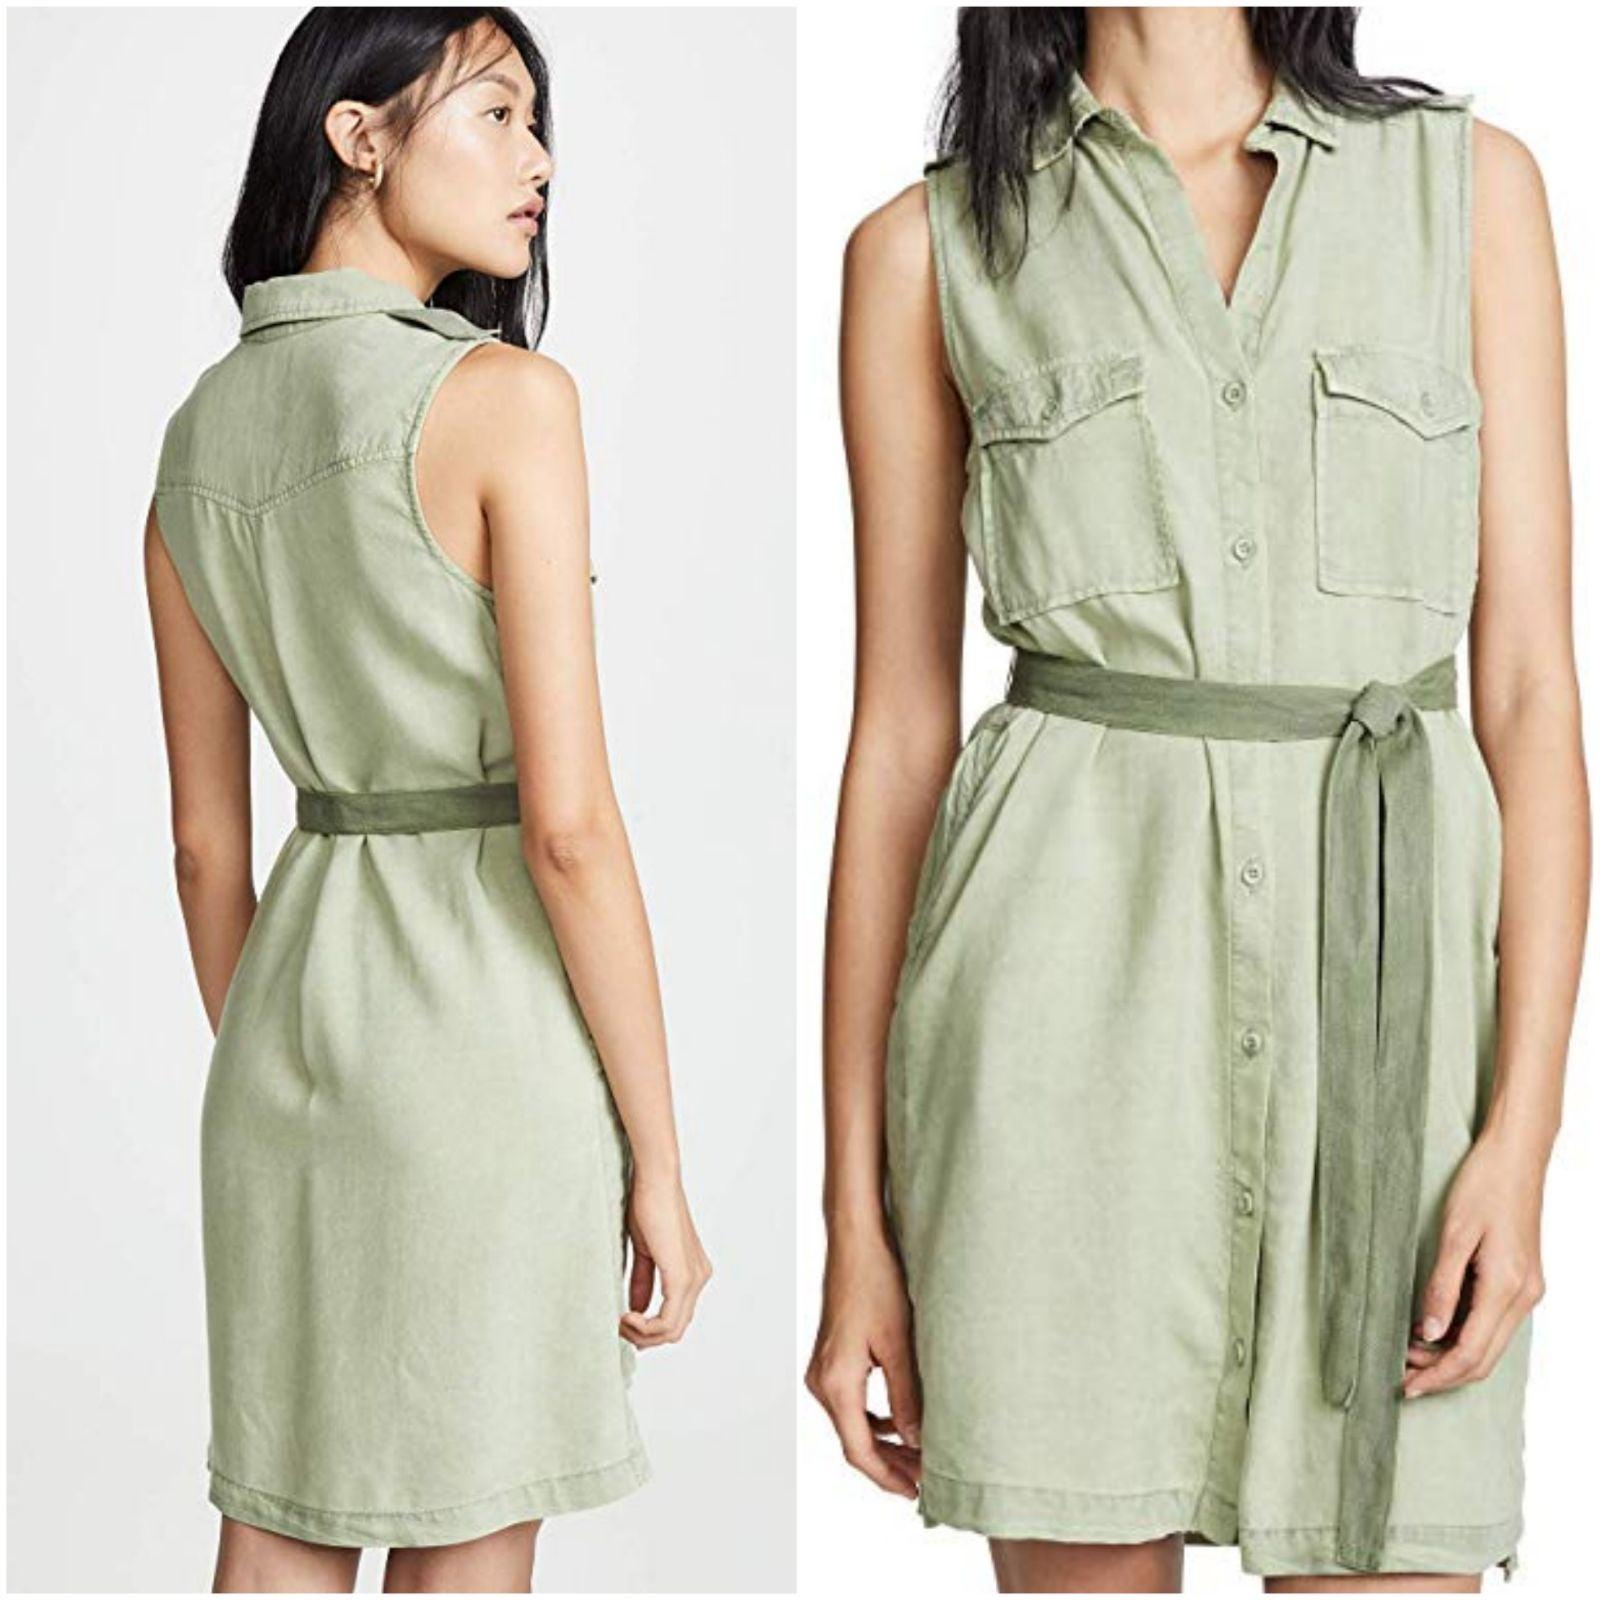 NWT Bella dahl patch pocket shirt dress